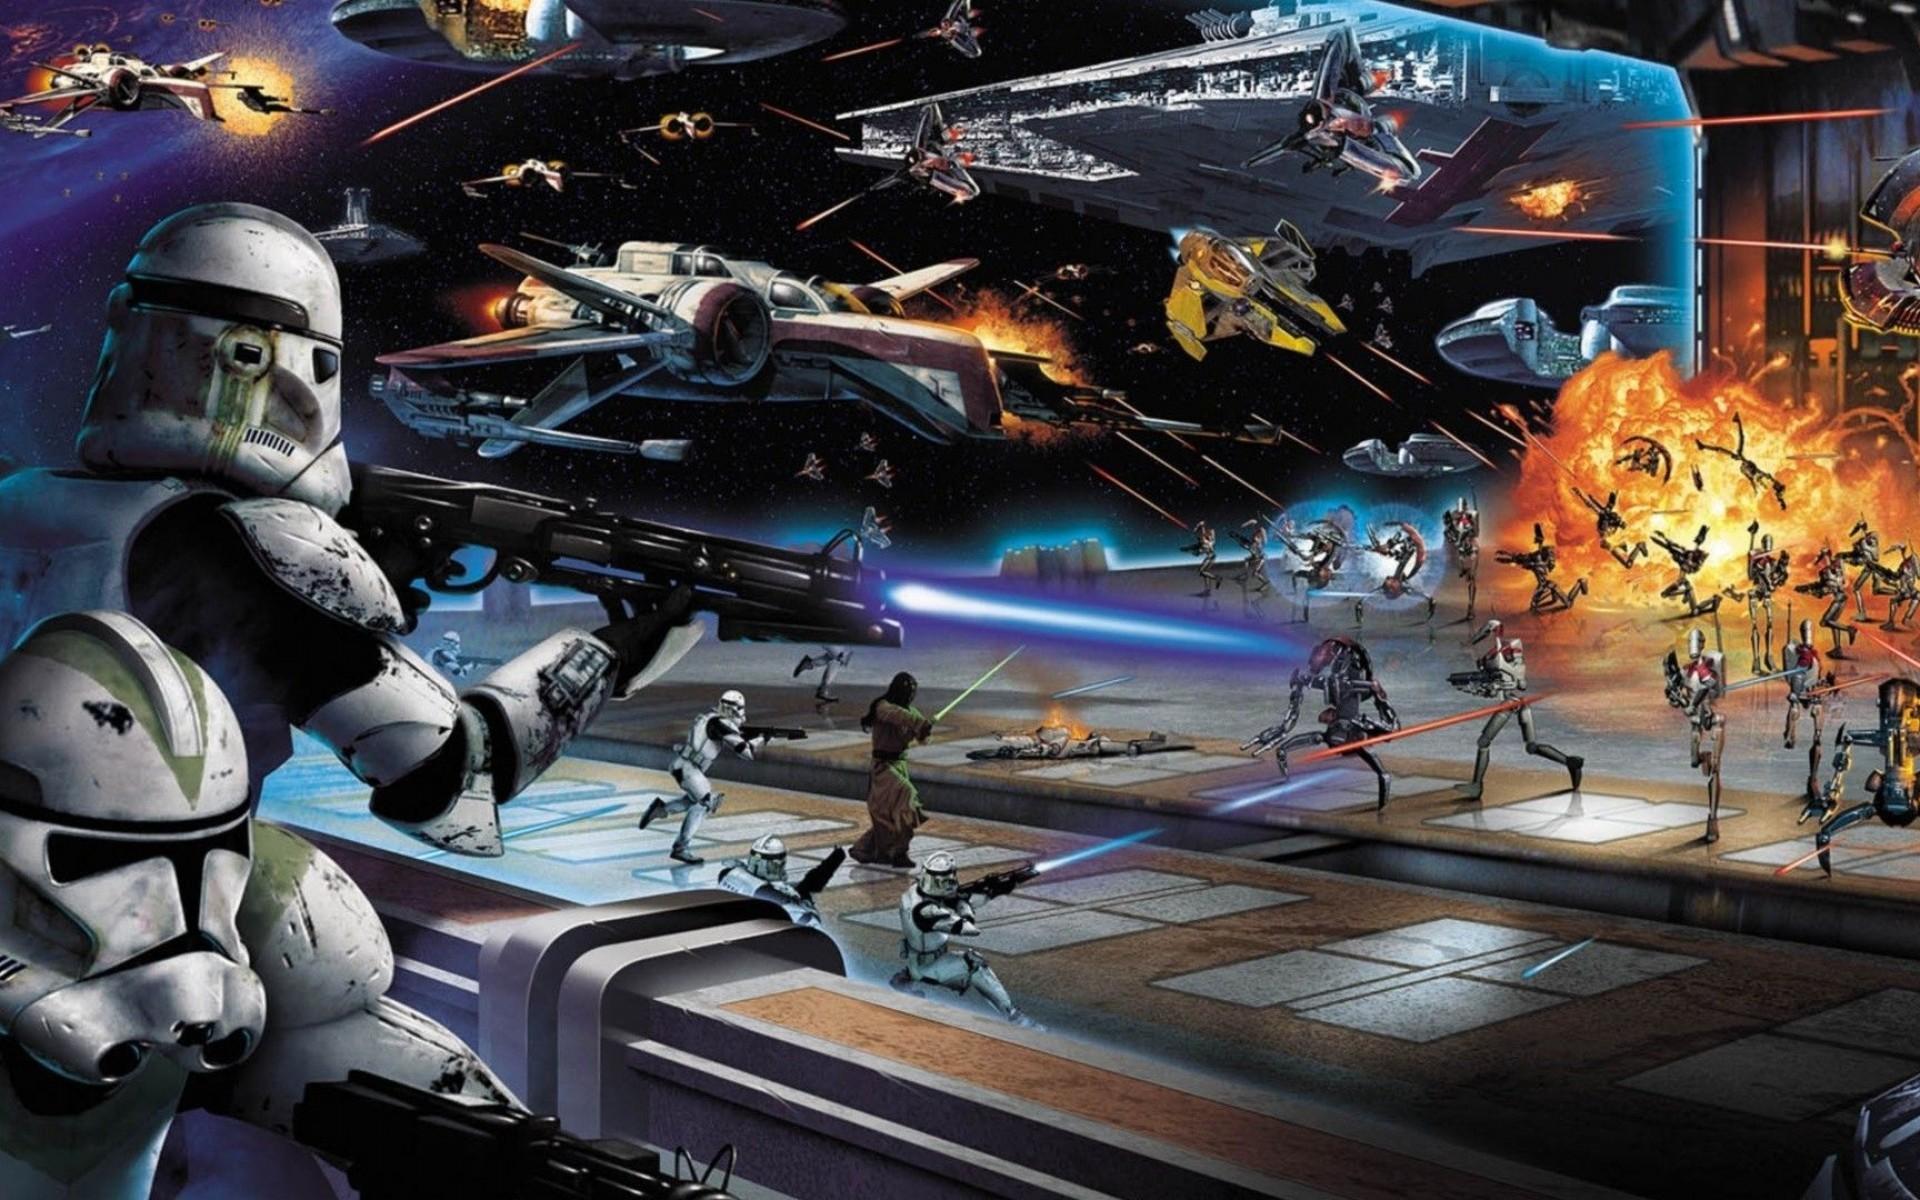 Star Wars Battlefront Sci Fi Warrior Battle R Wallpaper Star Wars Space Battle Background 1920x1200 Wallpaper Teahub Io